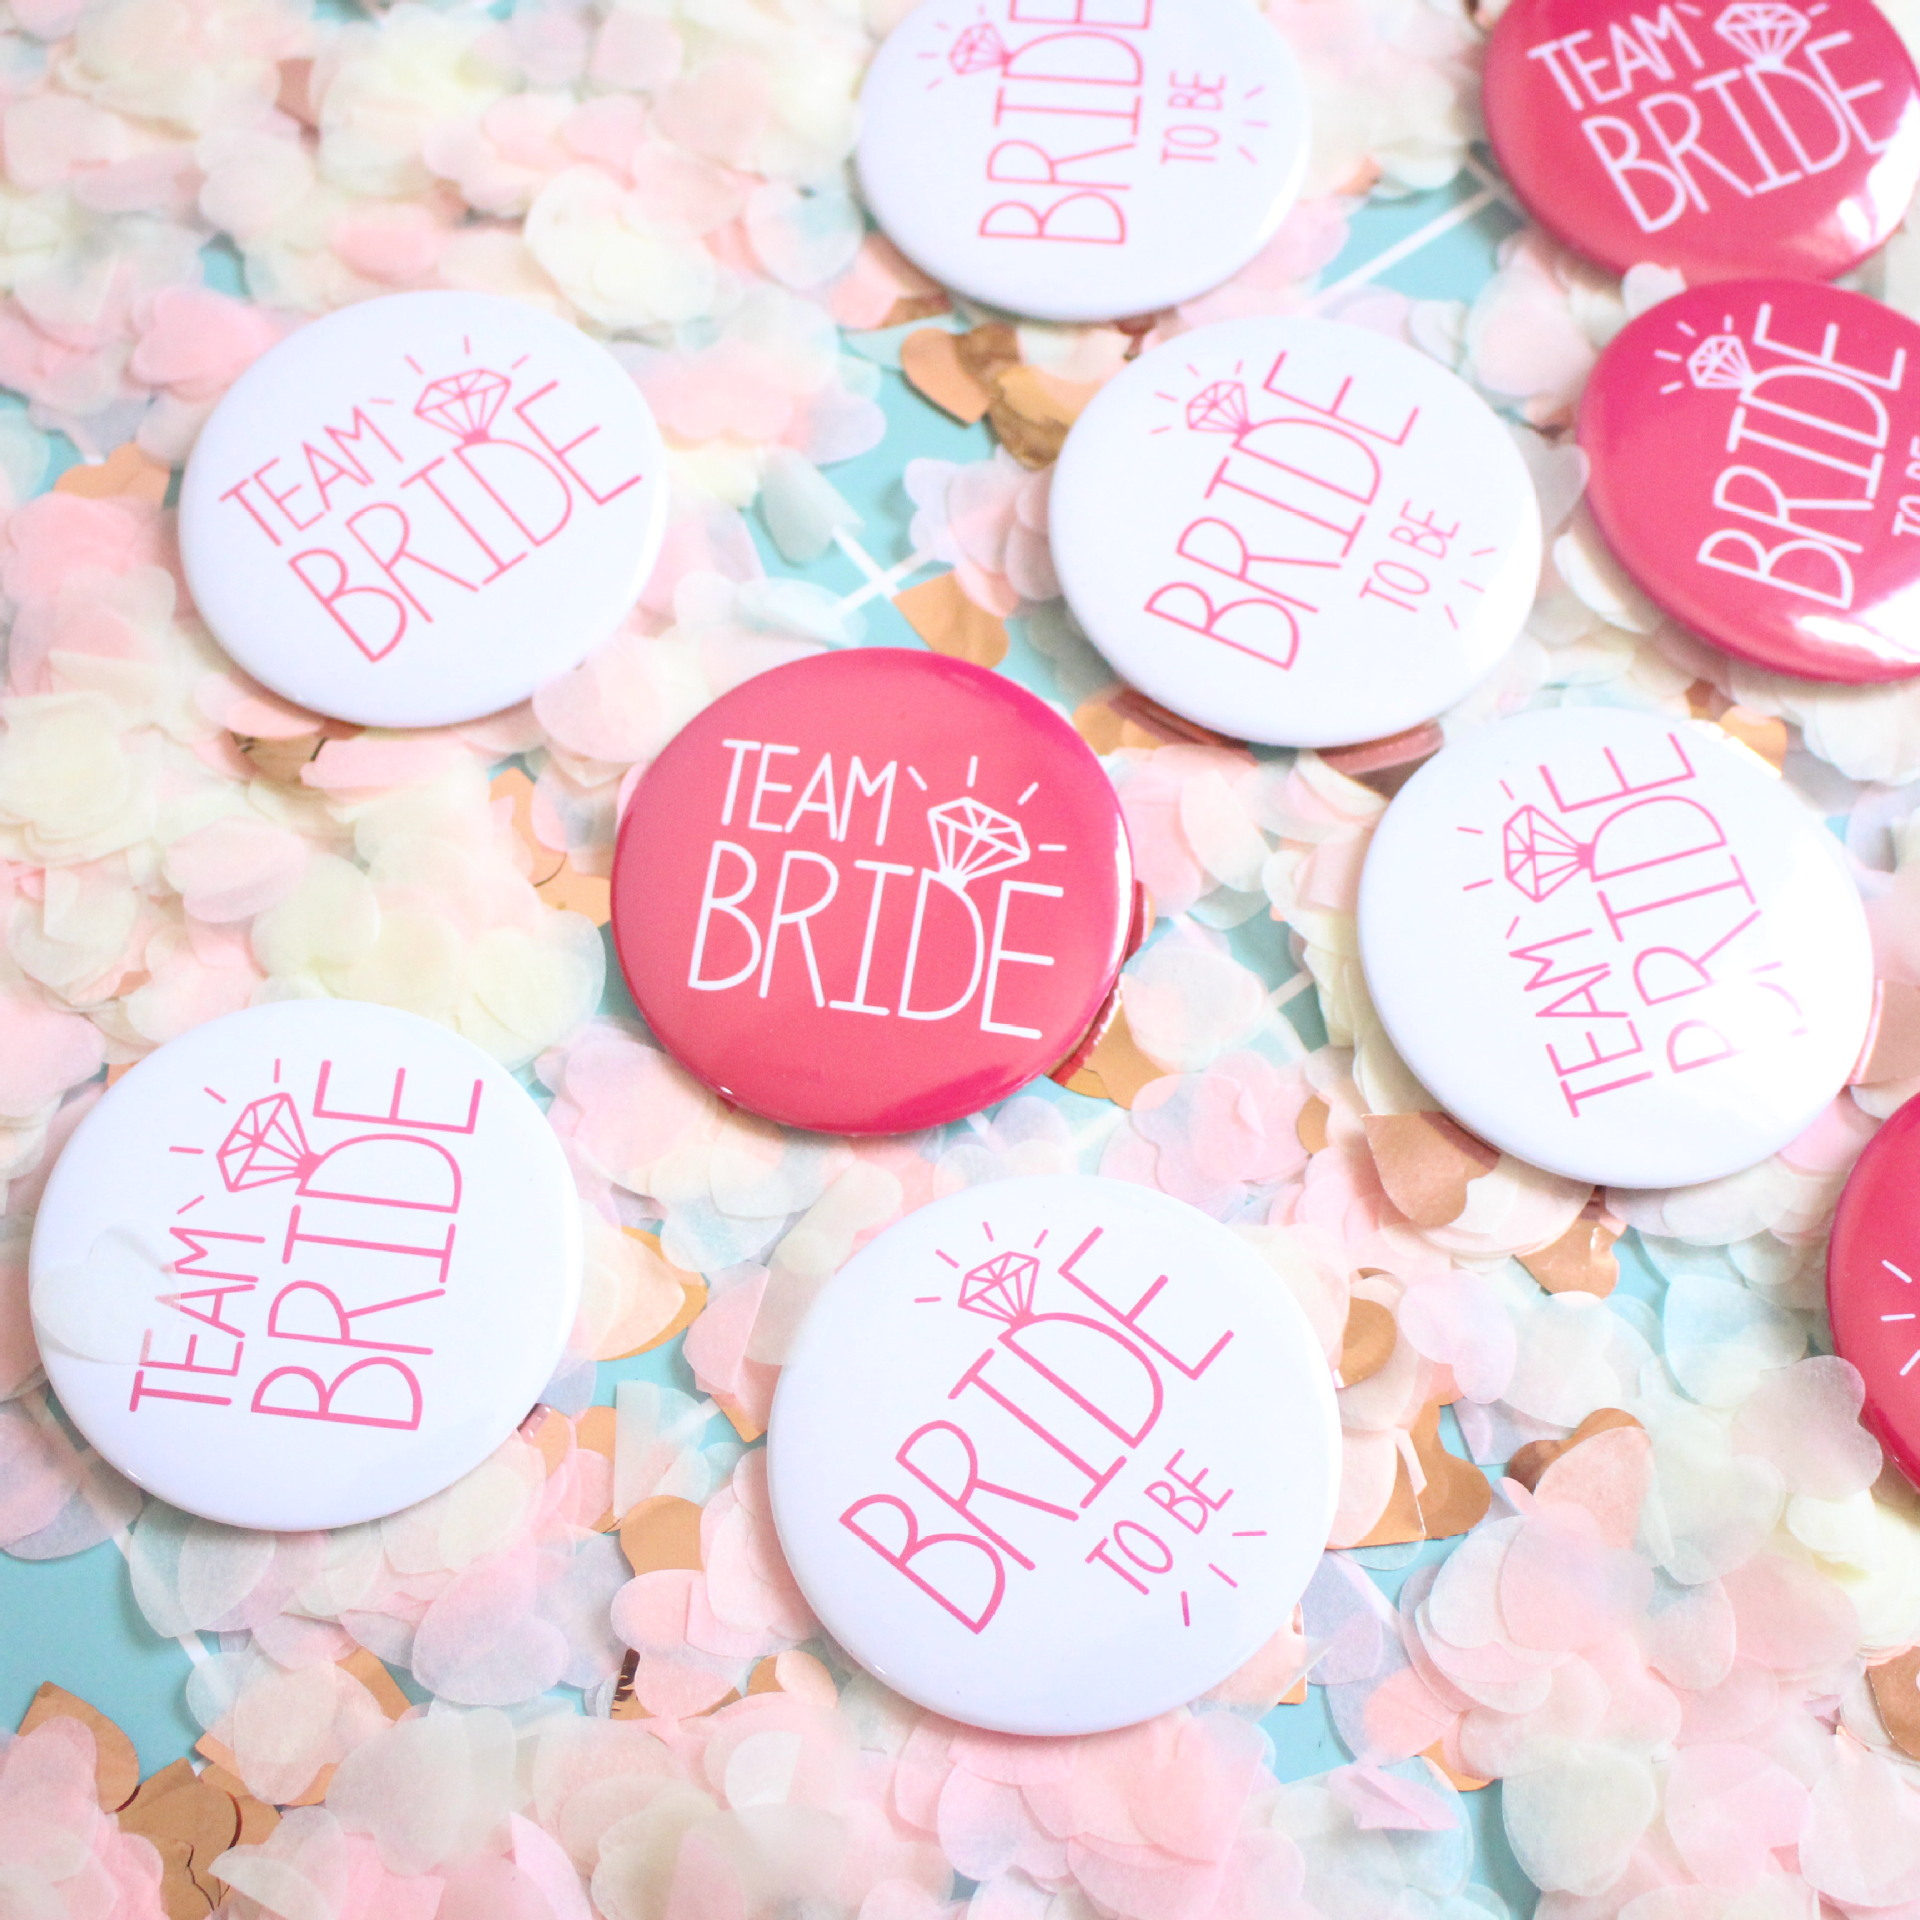 6/3/2pcs Bride To Be Badge Hen Party Bridesmaid Decoration Bachelor Party Team Bride Badge Bridal Shower Wedding Party Supplies